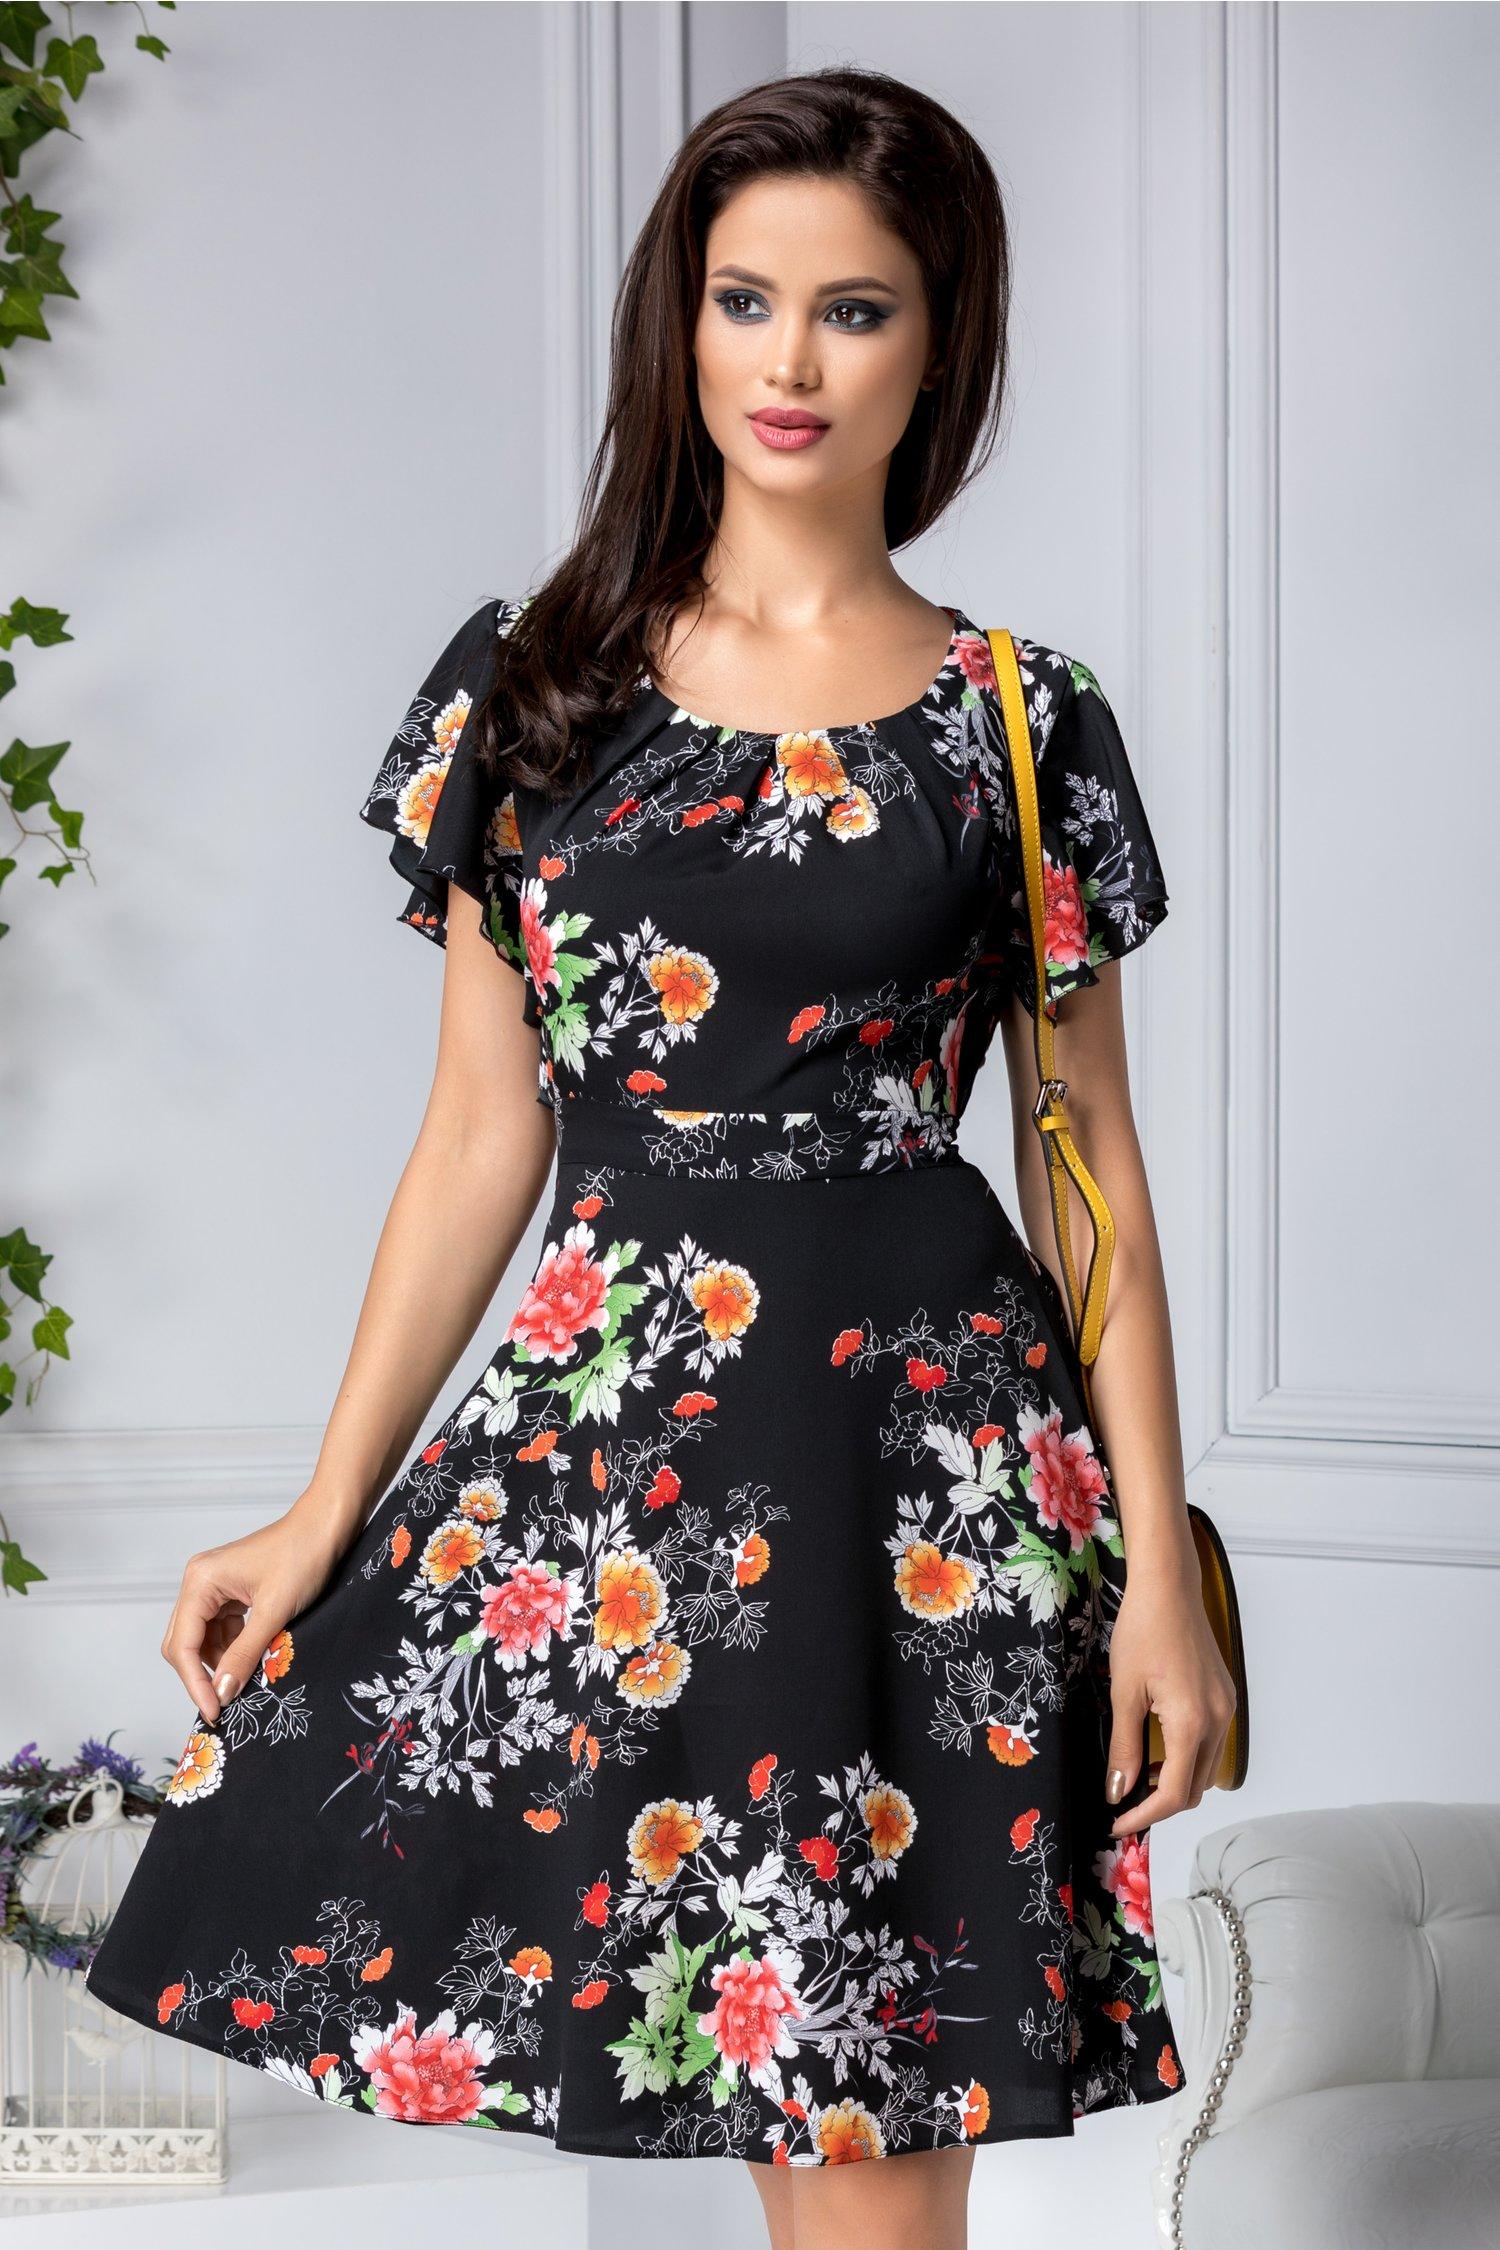 Rochie Sorana neagra cu imprimeu floral colorat